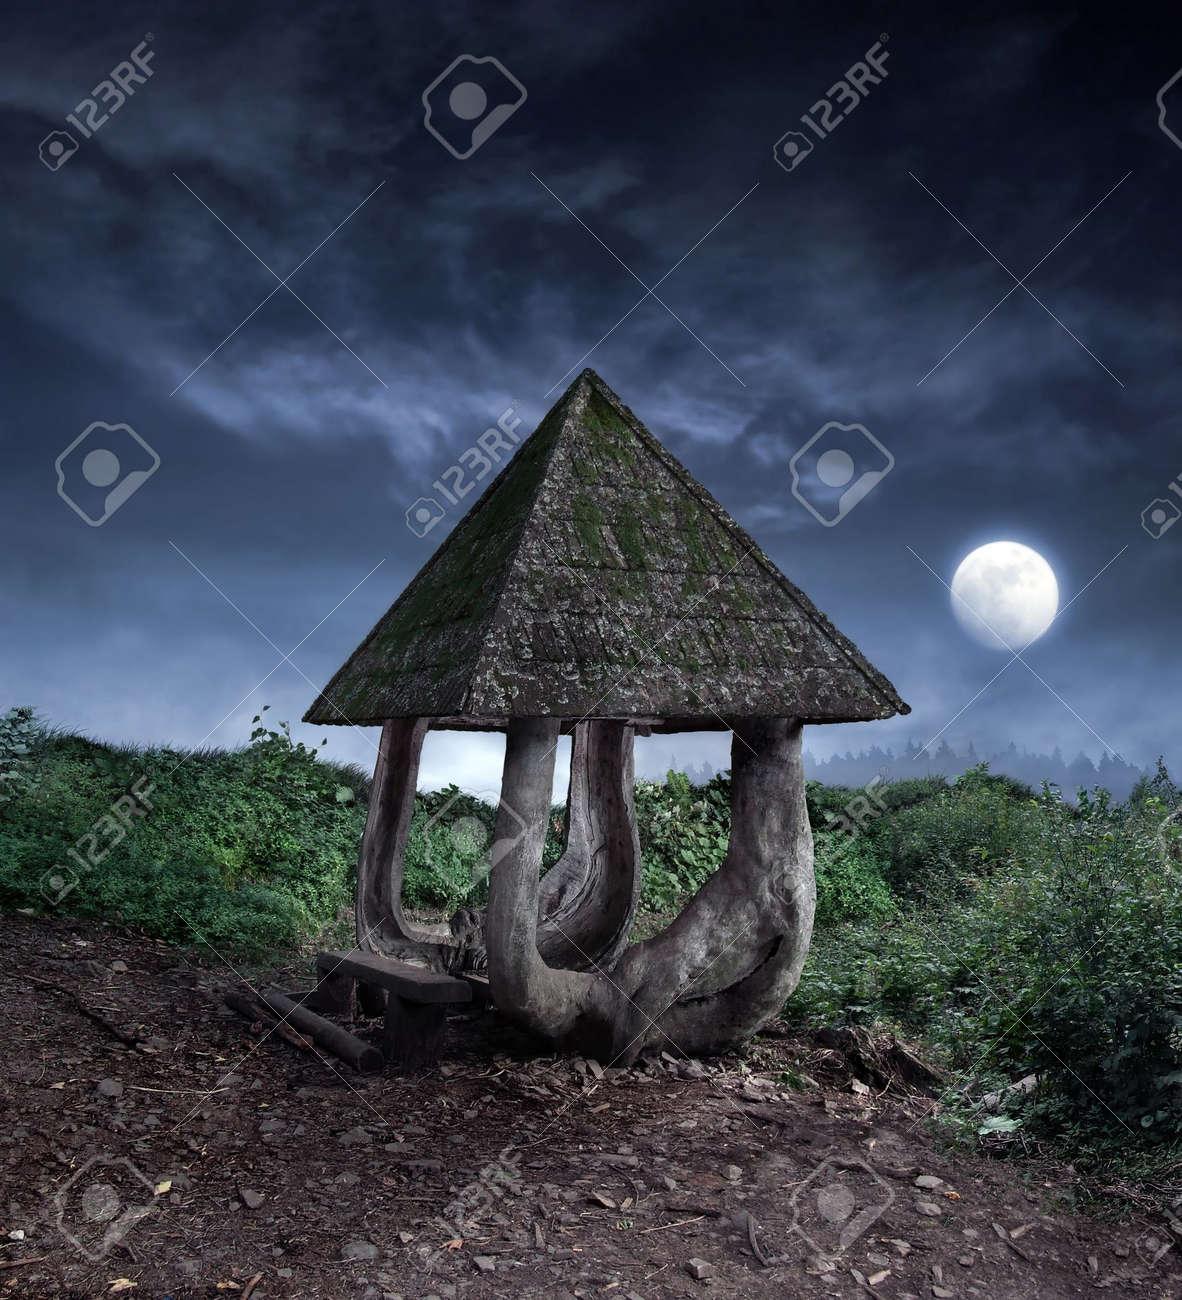 Fantasy summerhouse - 4194022